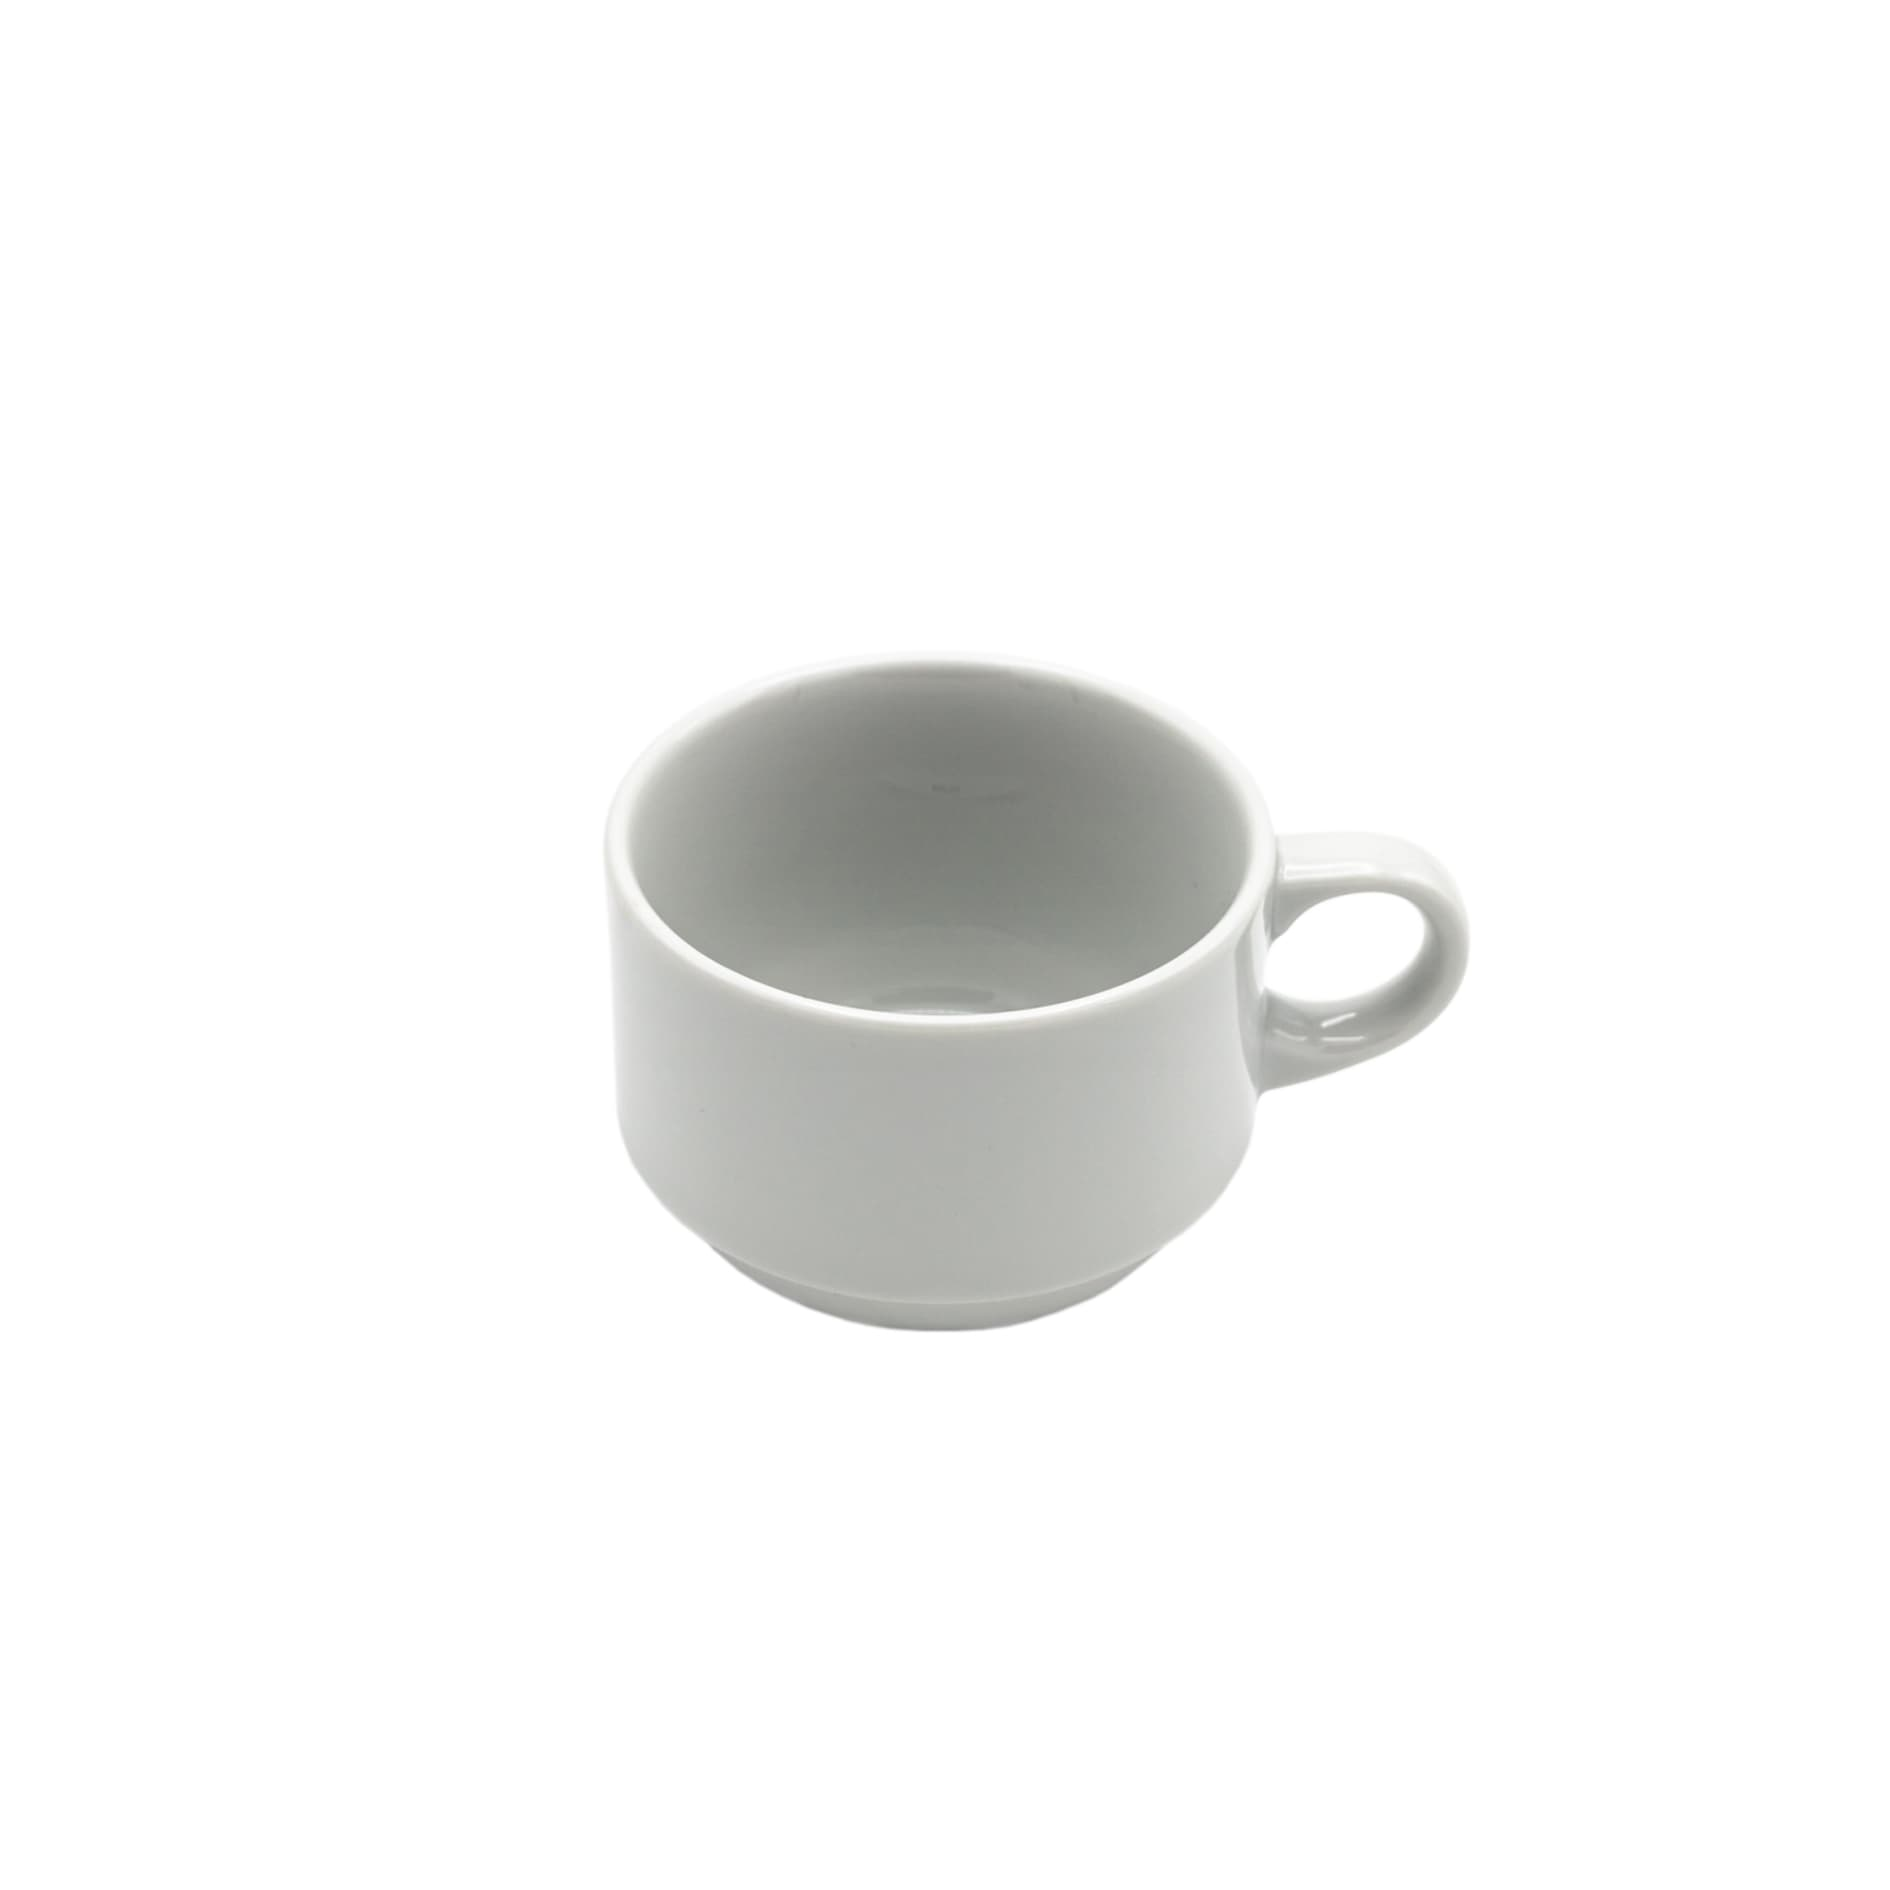 Kaffeetasse klein